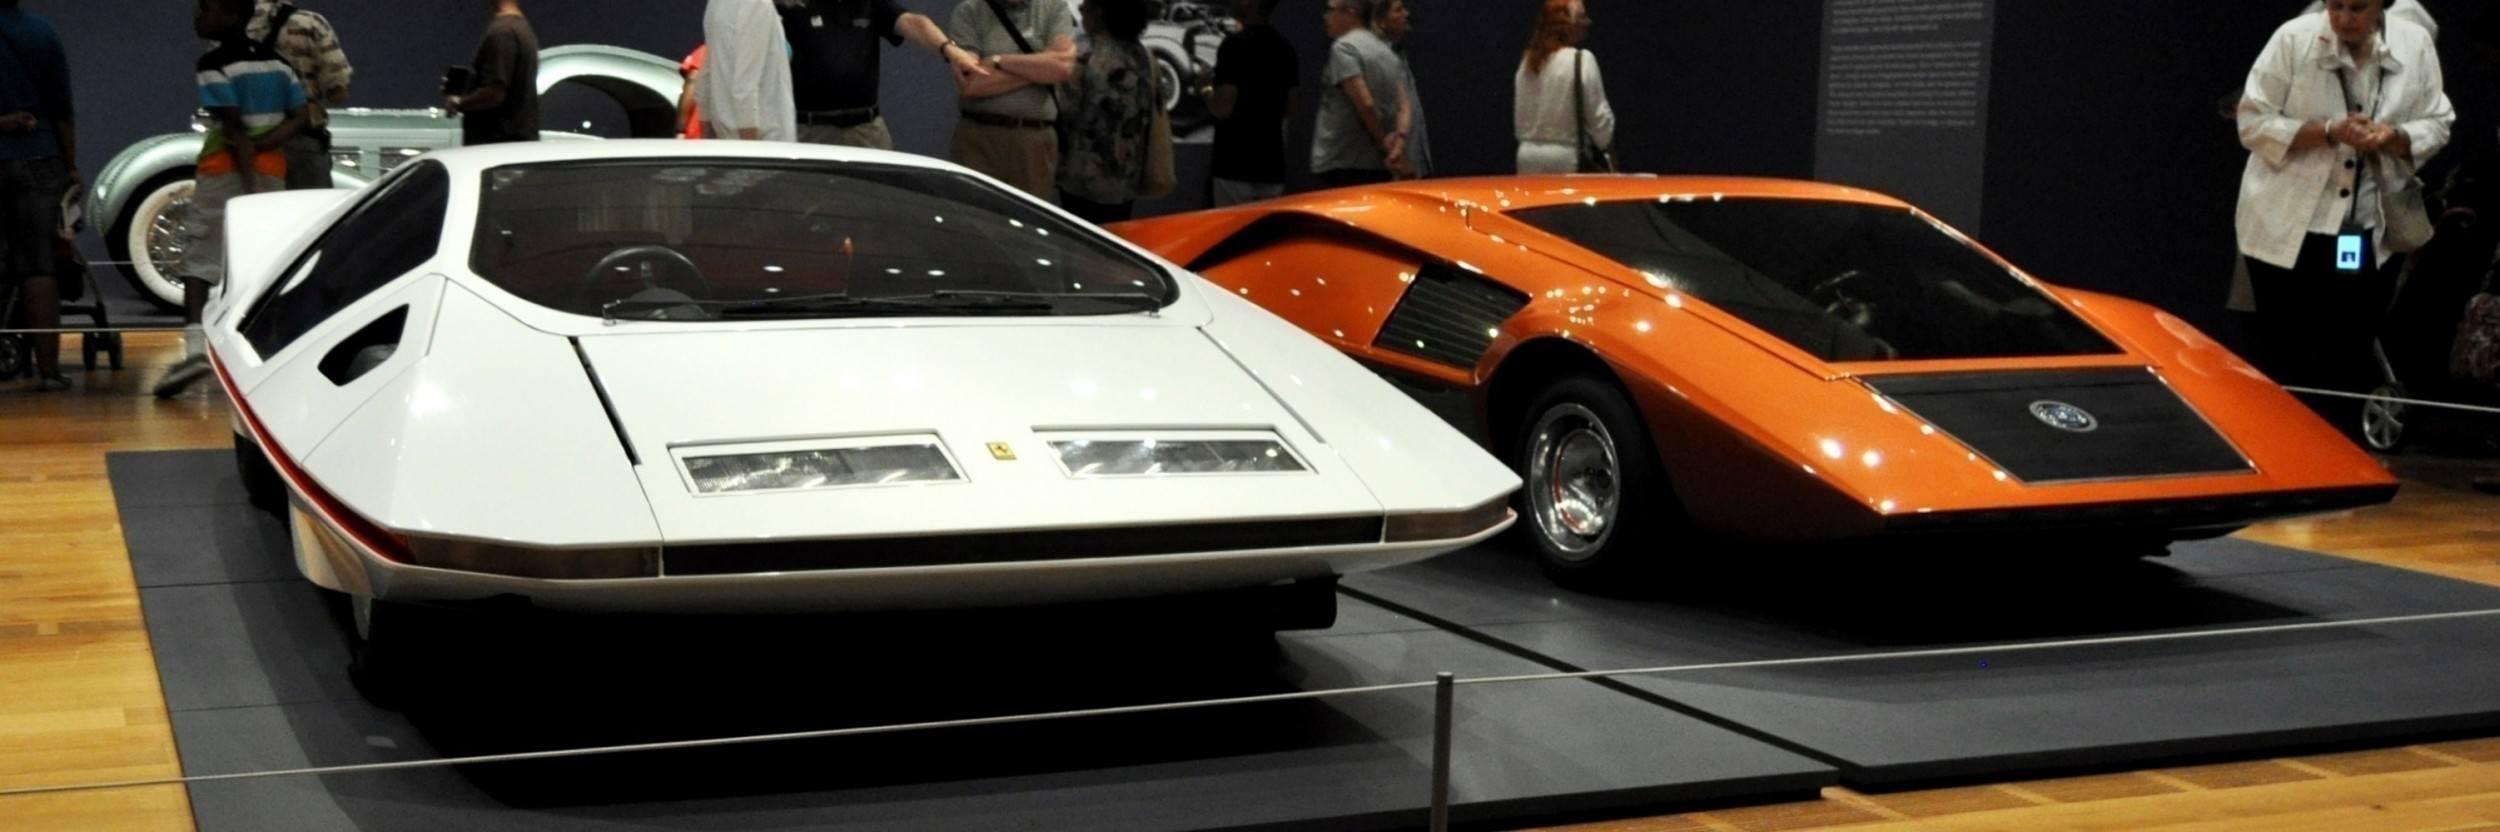 1970 Ferrari 512 S Modulo Pictures to Pin on Pinterest ...